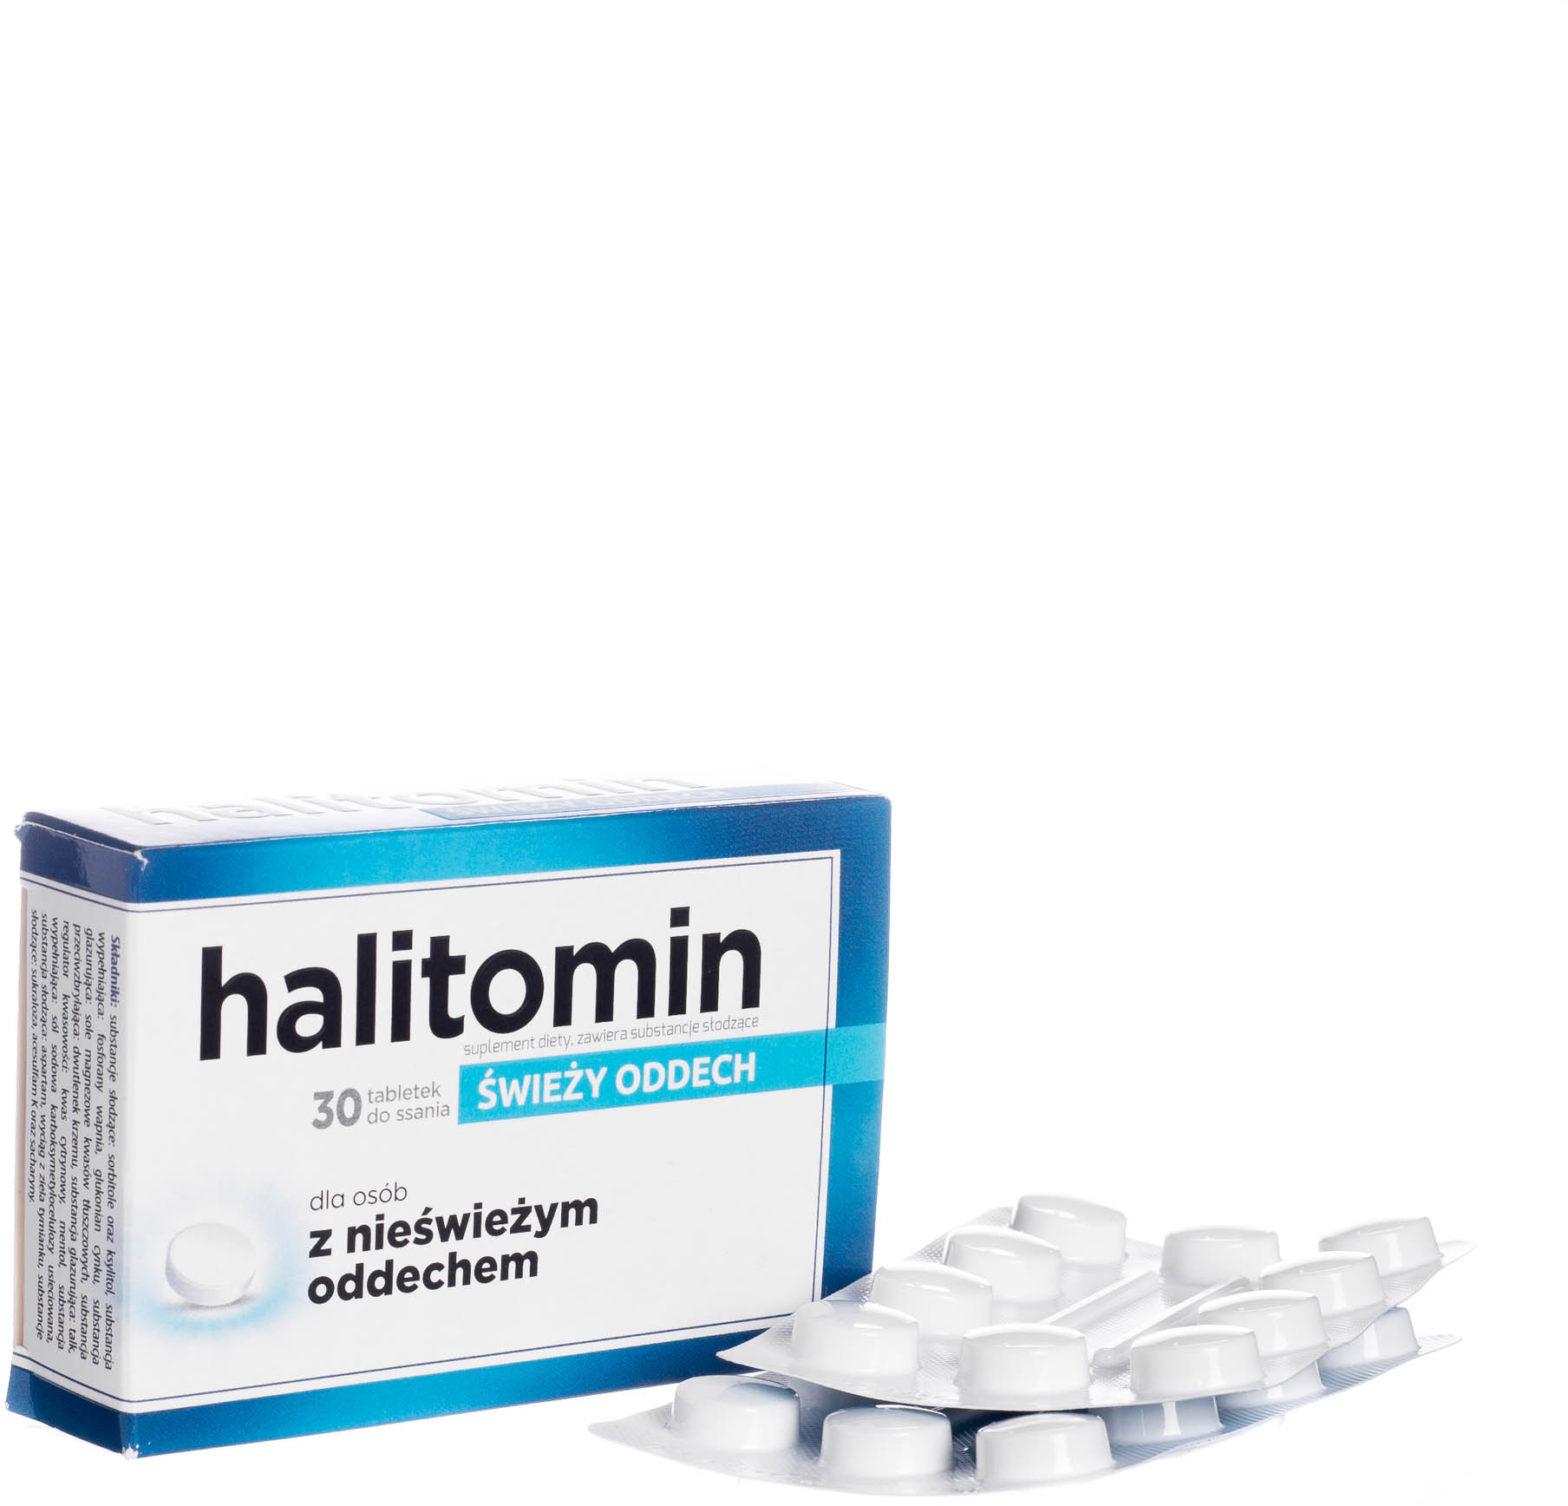 Aflofarm HALITOMIN 30 tabl do ssania 3090461